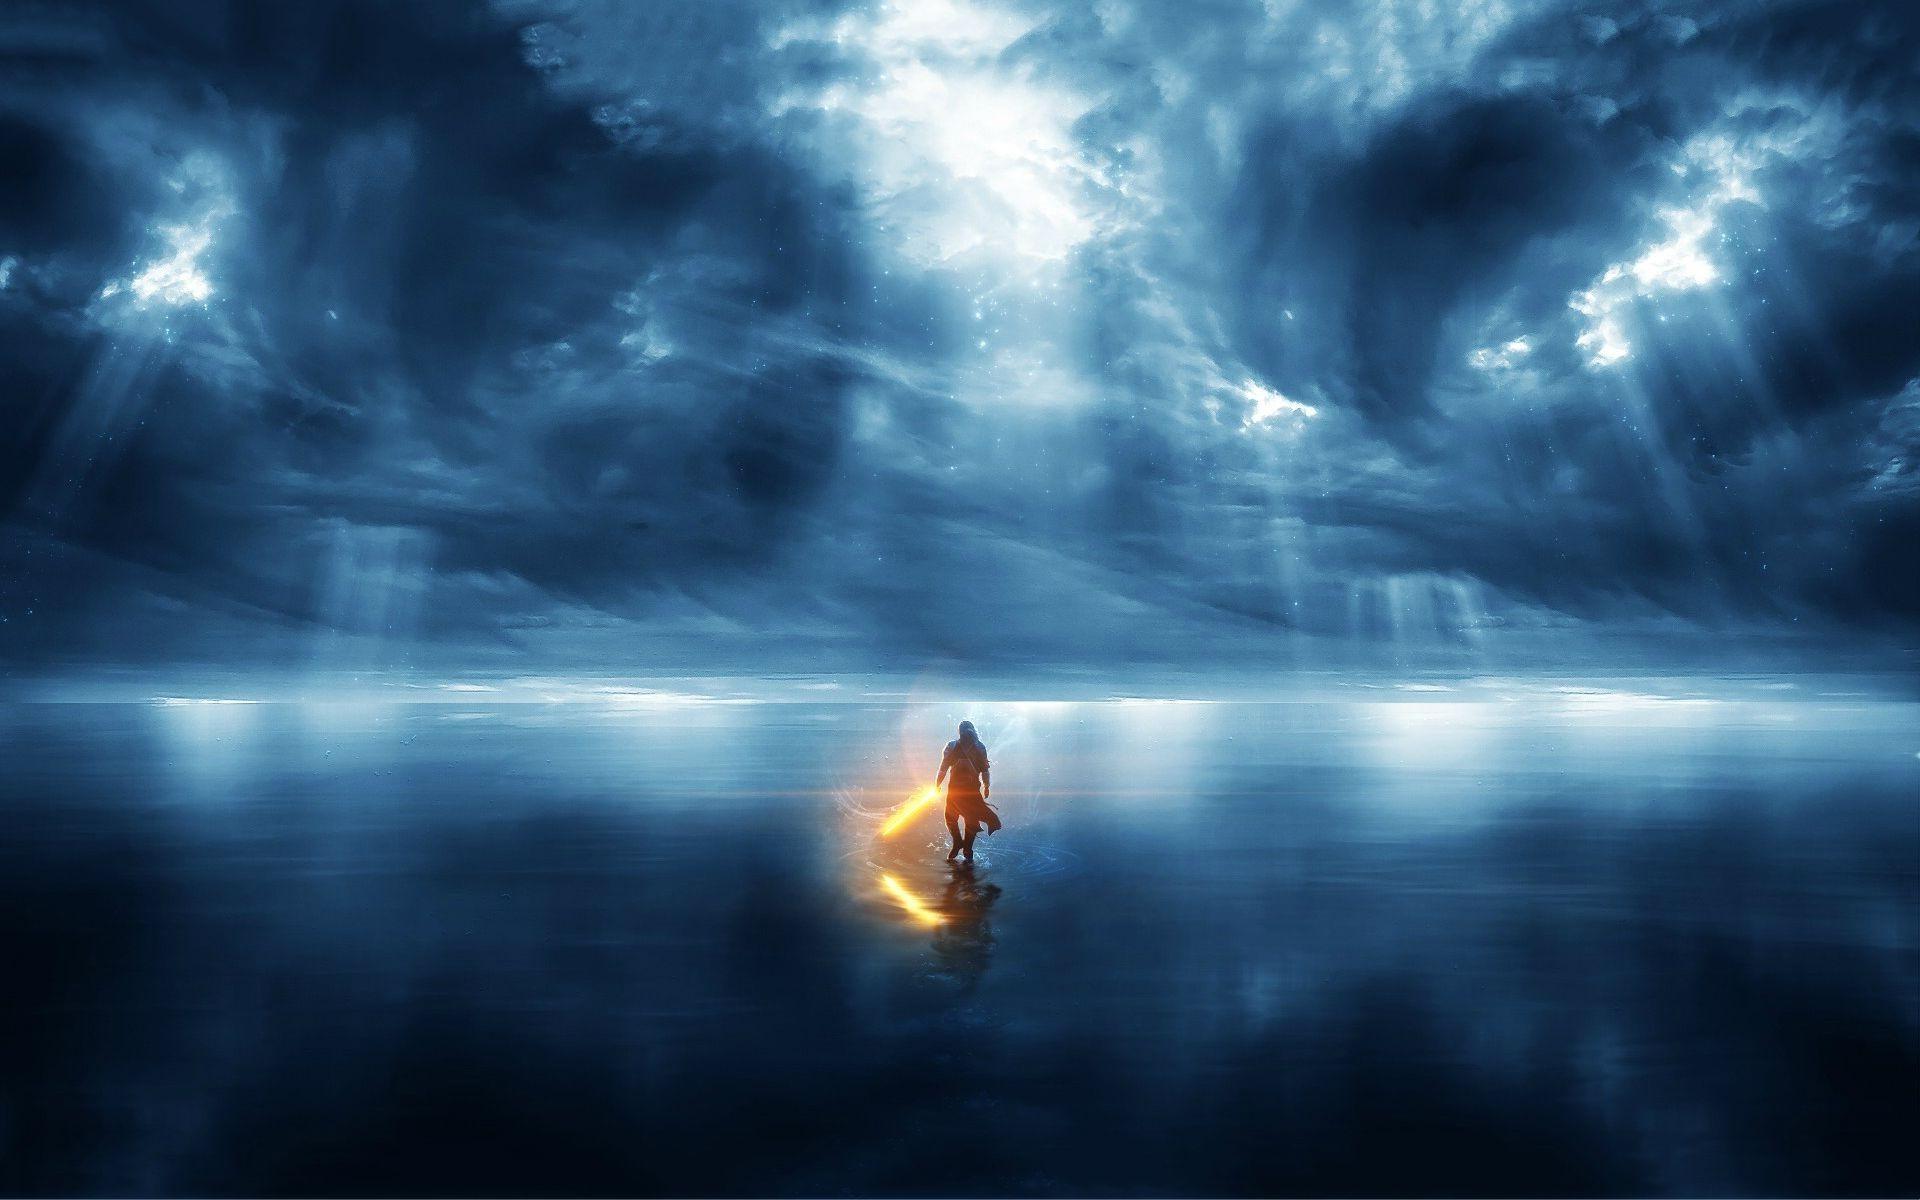 Wallpaper Sunlight Star Wars Sea Reflection Sky Storm